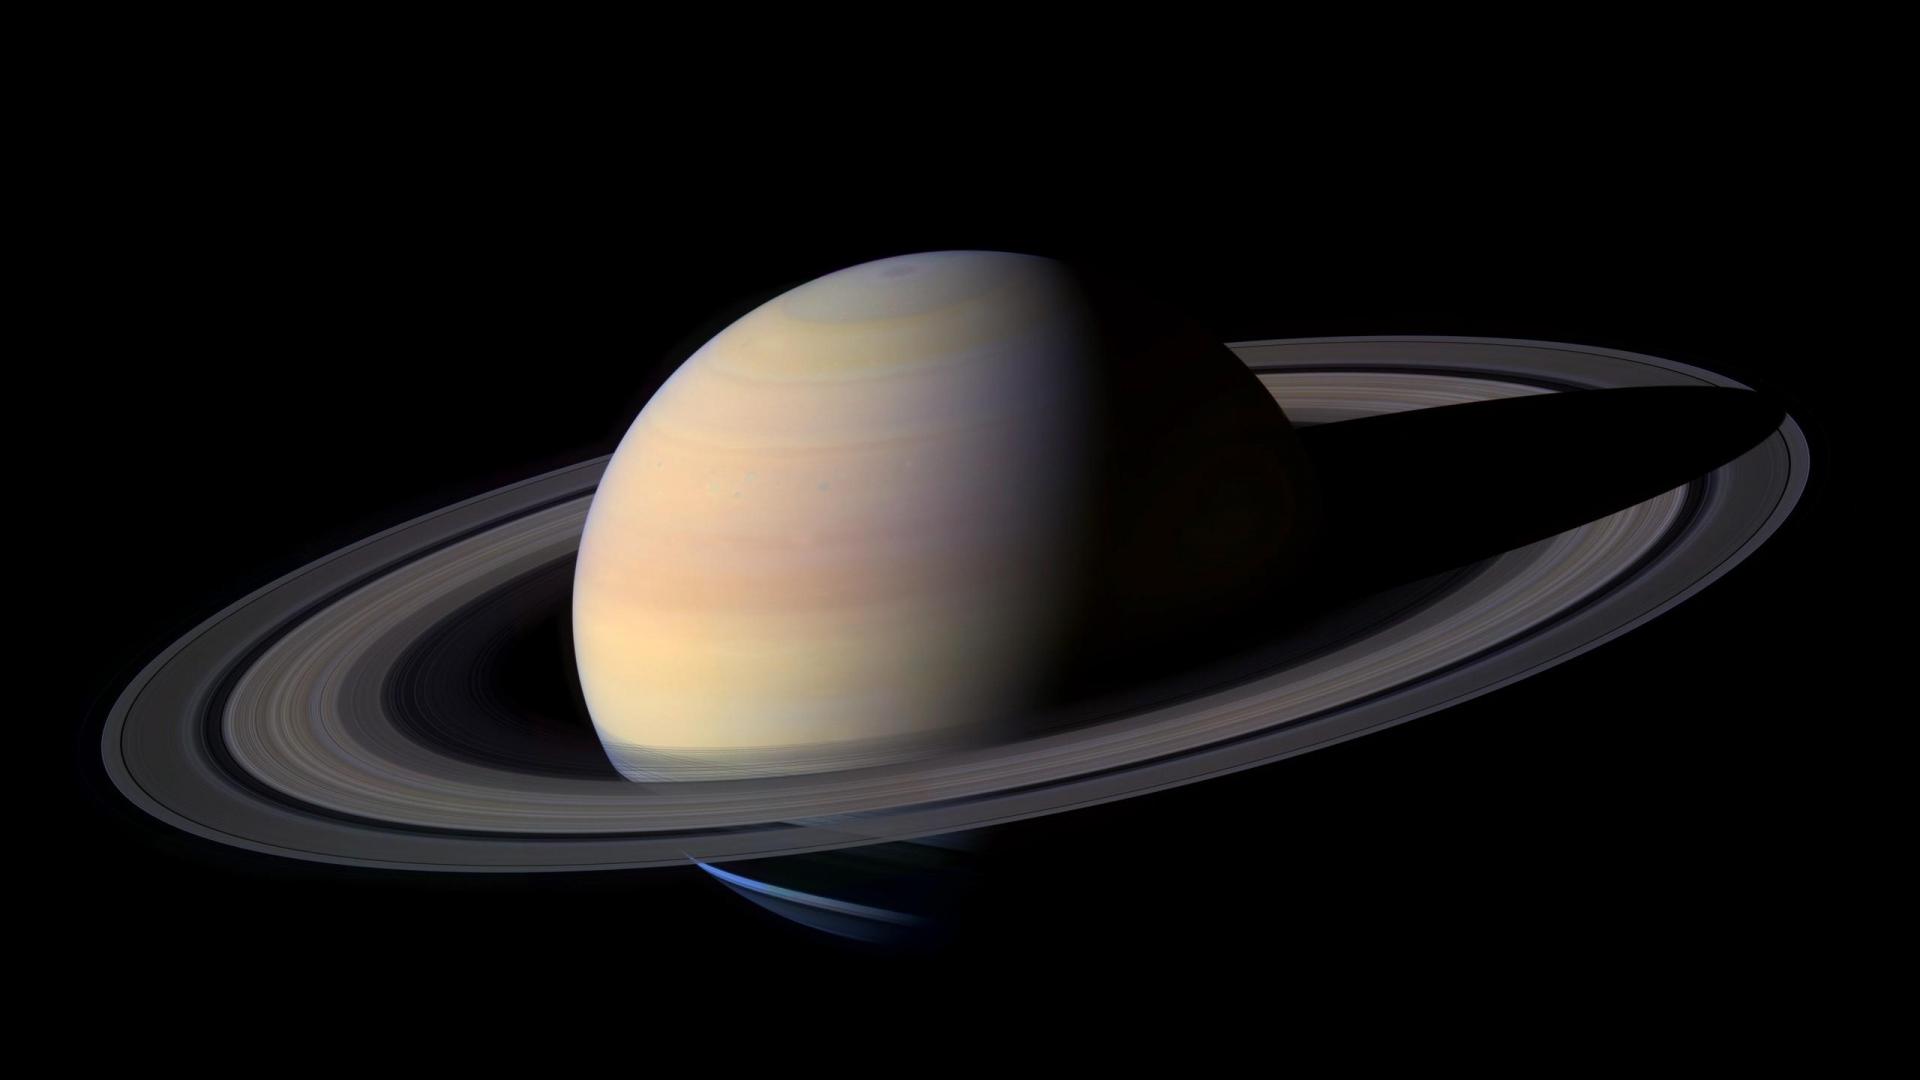 Saturn Planet Wallpaper 62301